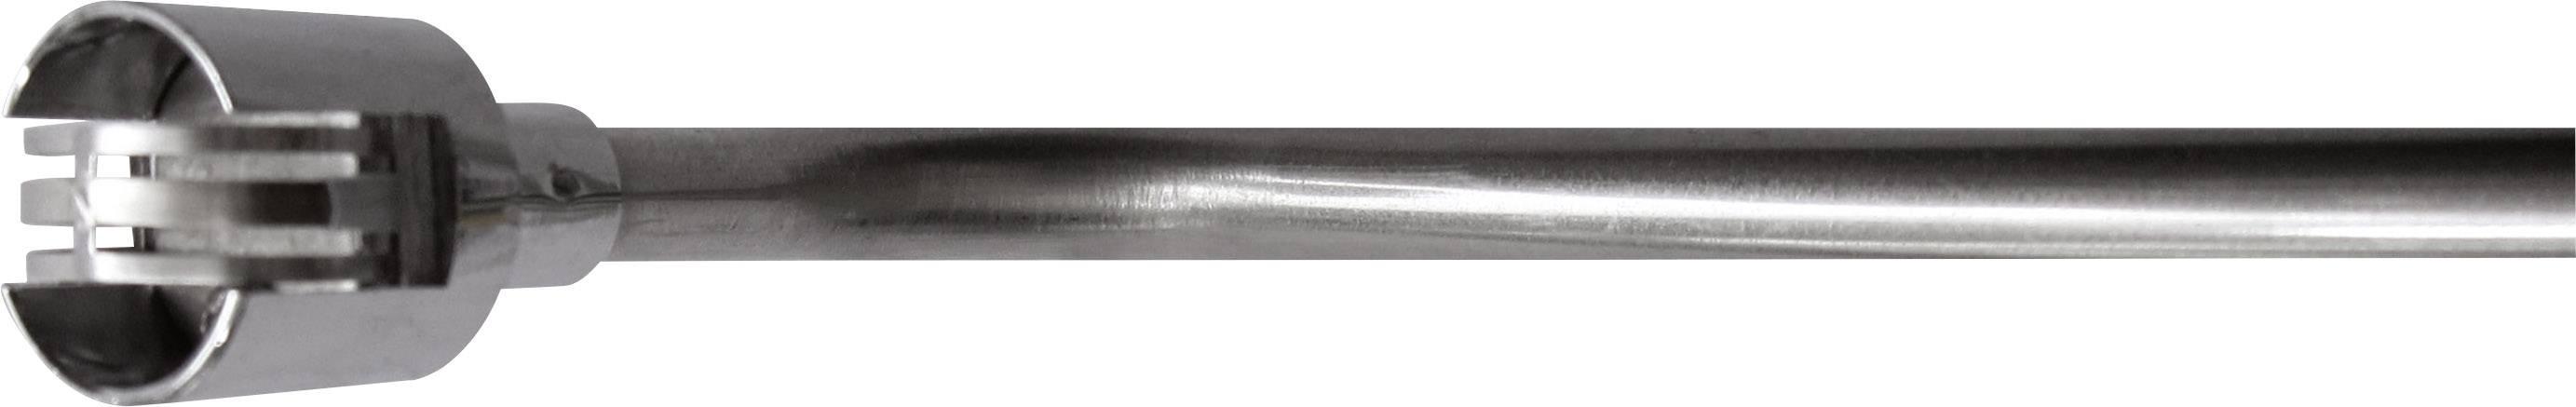 Teplotné čidlo Greisinger GOF 400 VE, typ K, -65 až +400 °C